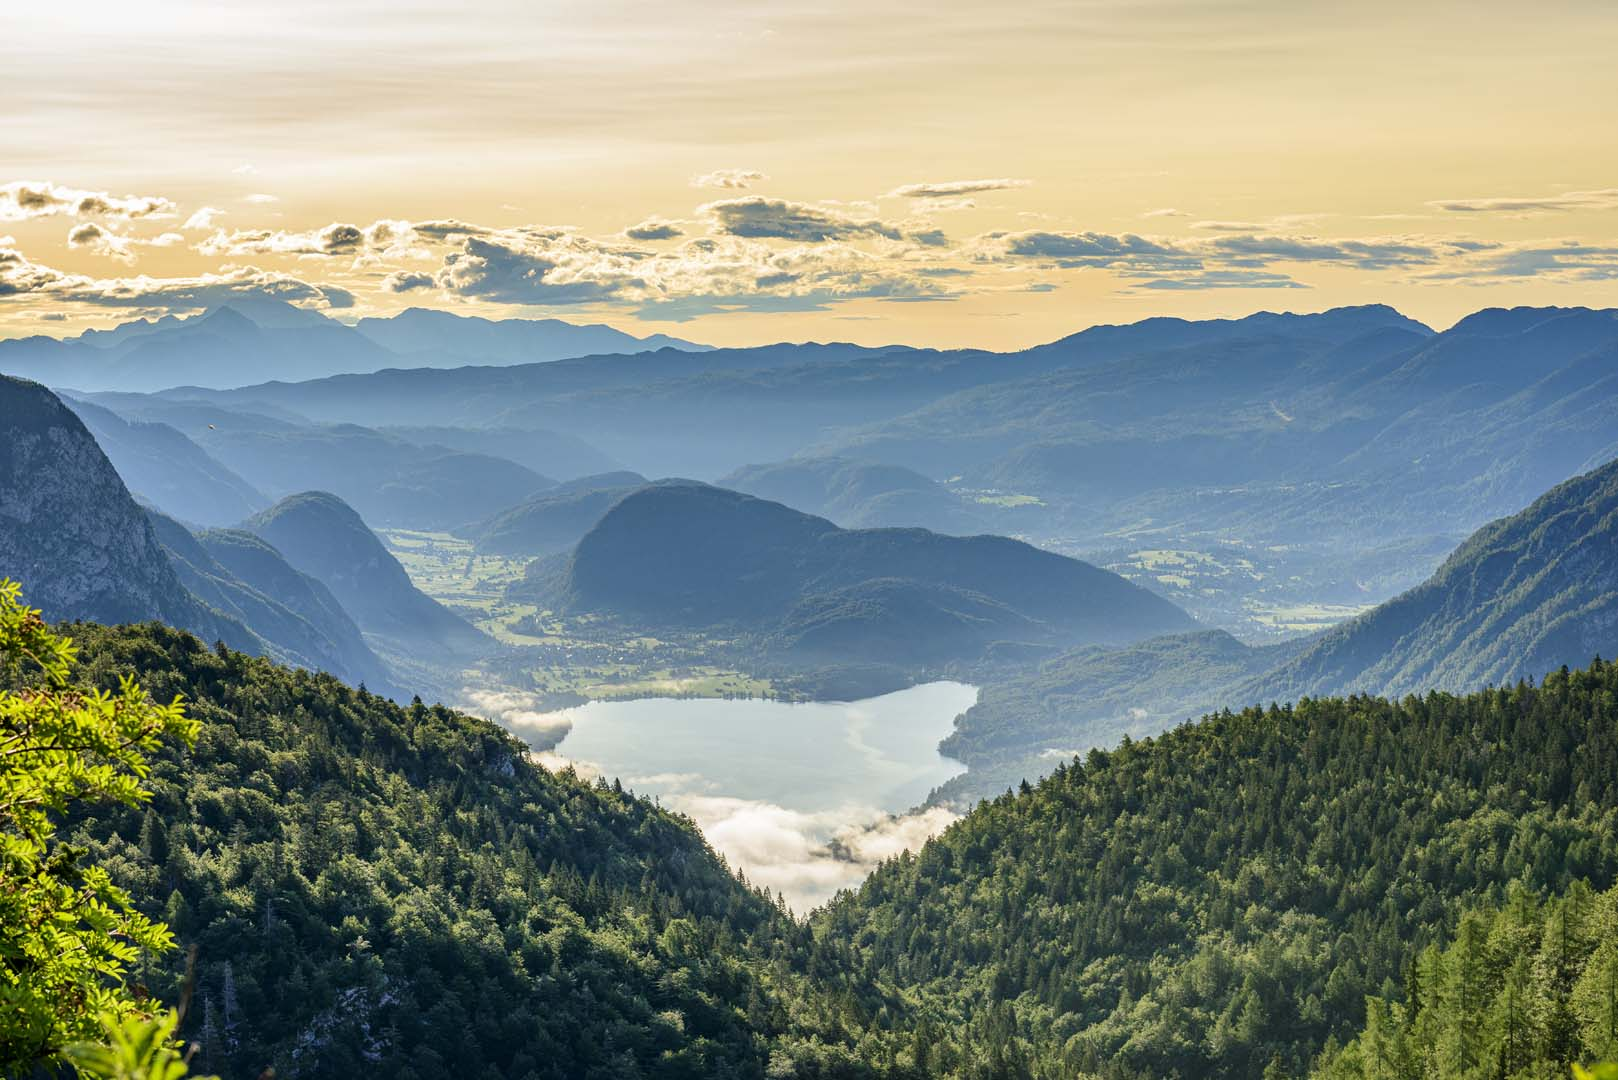 Slovenie 201907 360 HR © Peter Trimbos